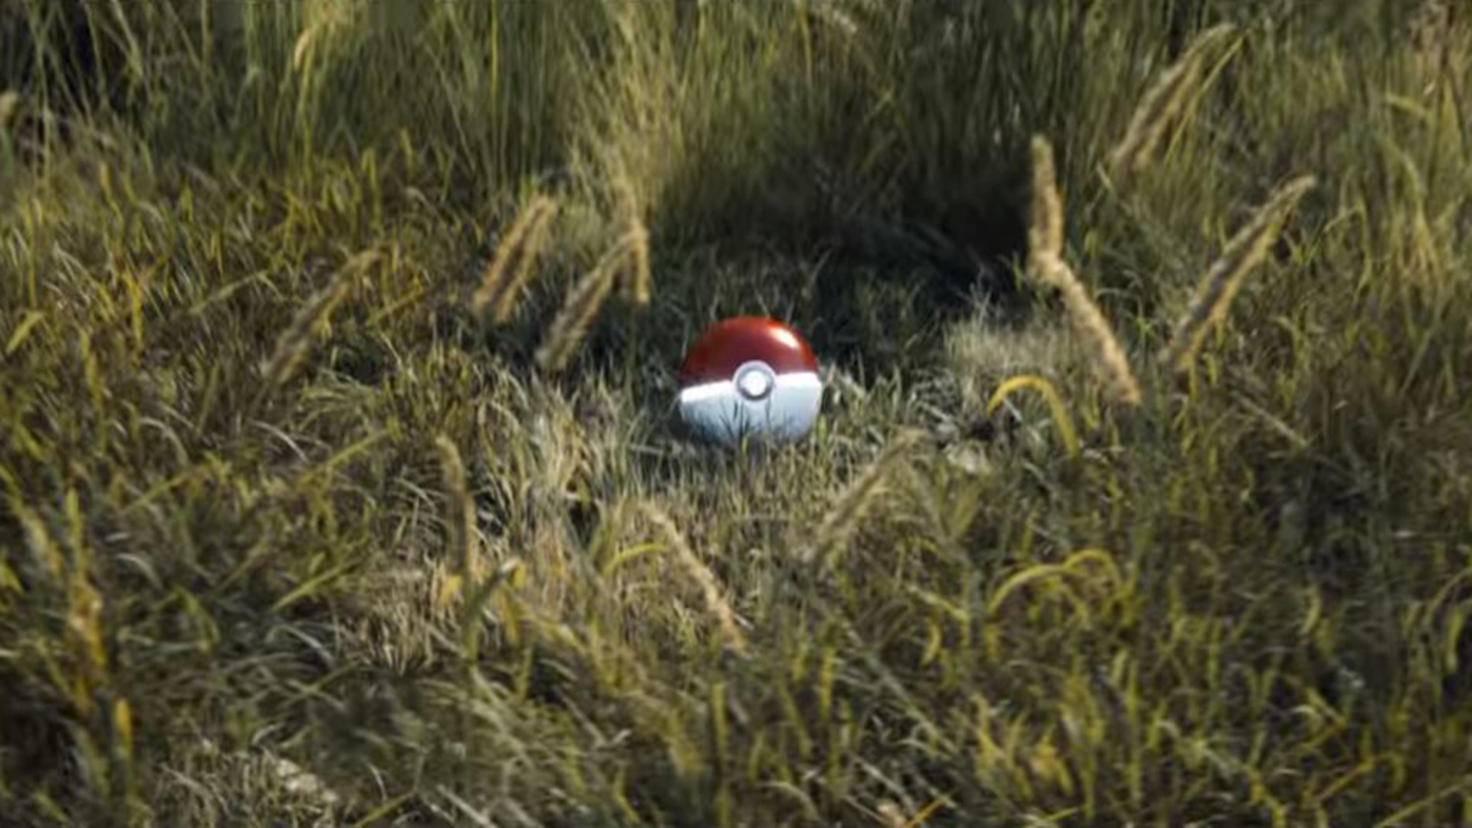 Pokéball in Pokémon Meisterdetektiv Pikachu Trailer 2